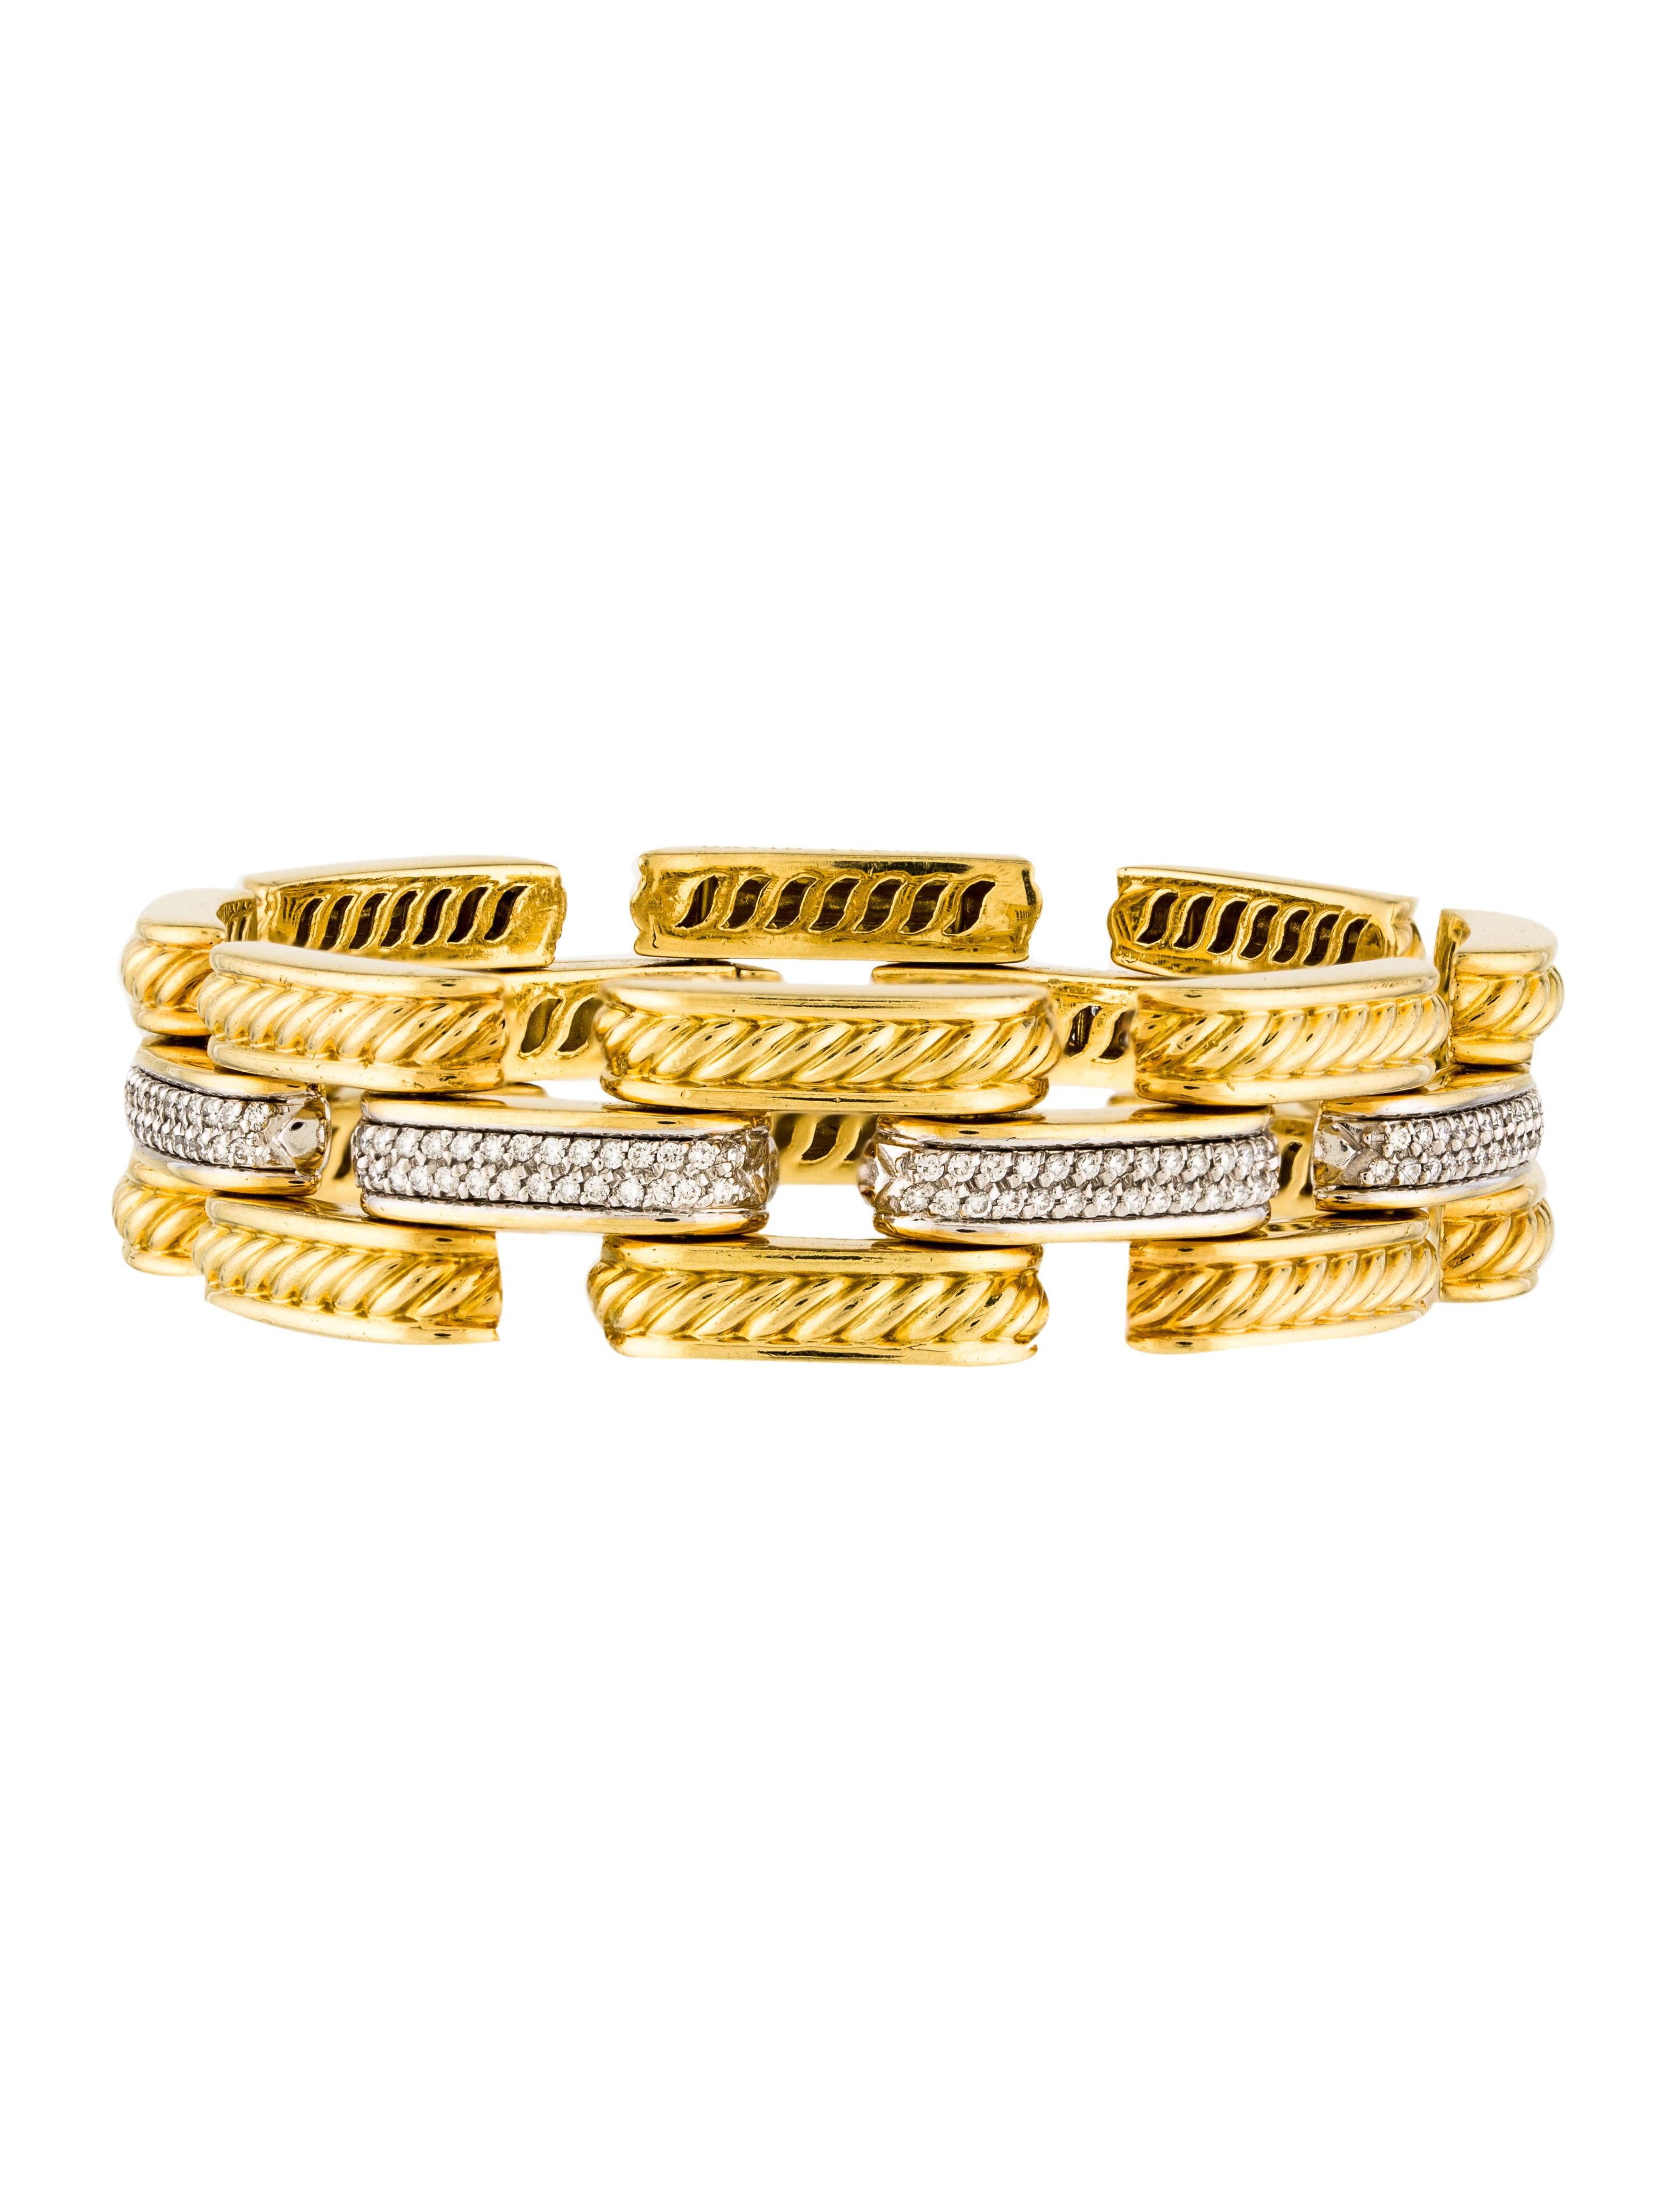 Round Dining Room Tables For 10 David Yurman 18k Diamond Gatelin Bracelet Bracelets